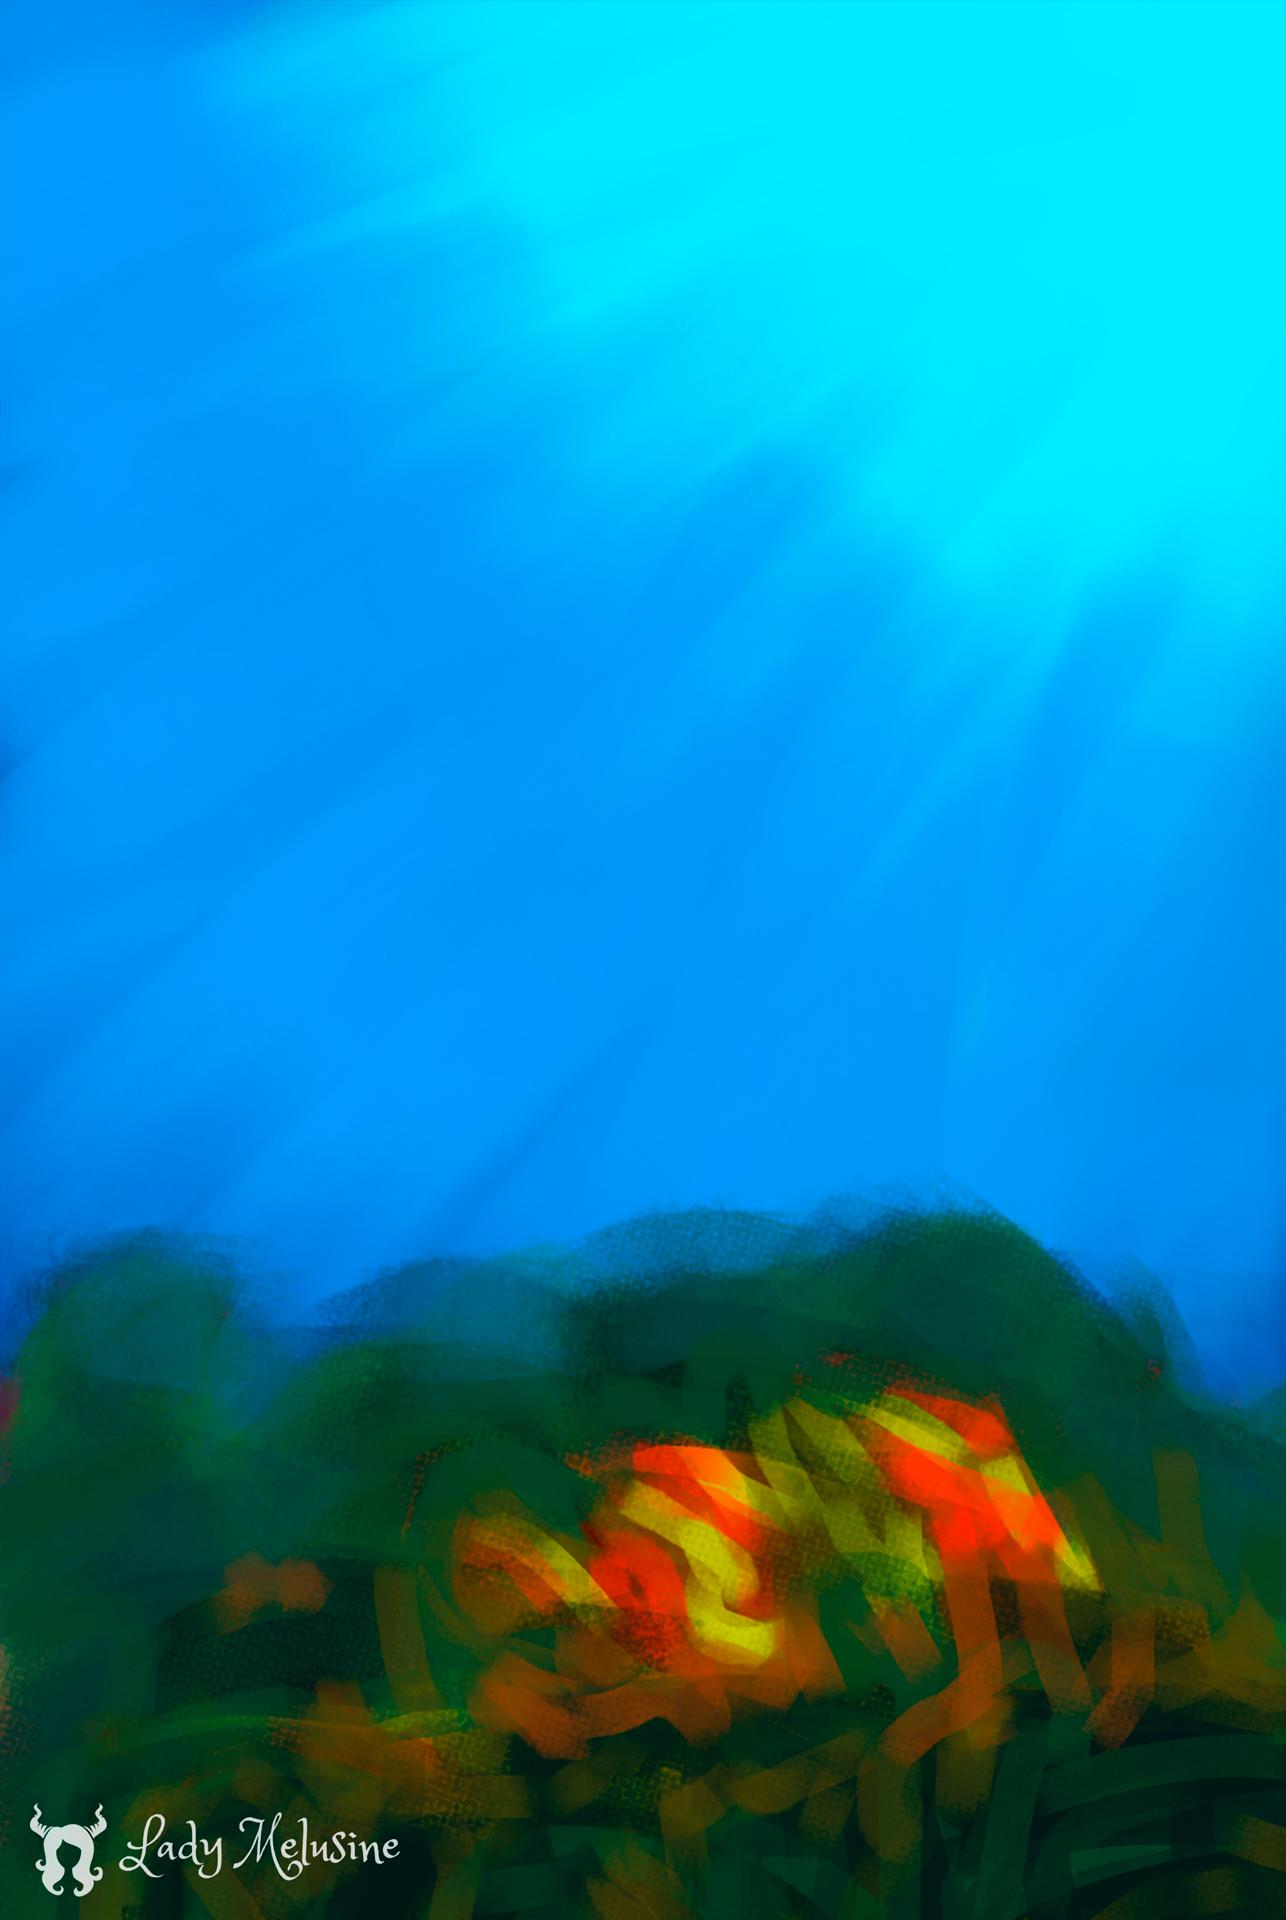 Digital Painting Carte Recifs Requins 02 Lady Melusine